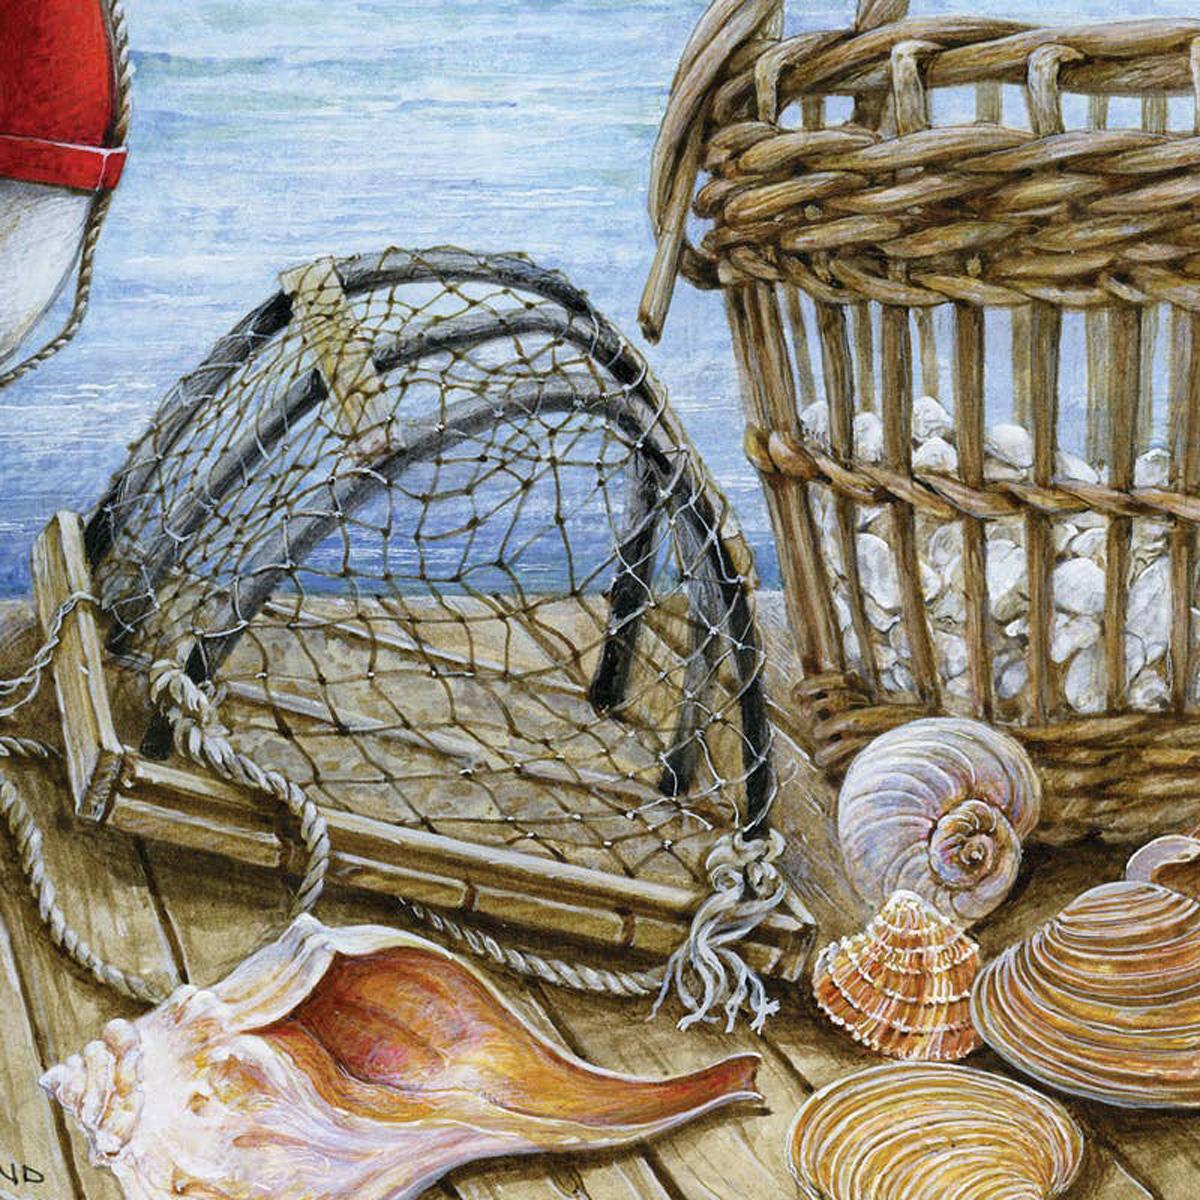 Shells on the Dock Seascape / Coastal Living Jigsaw Puzzle